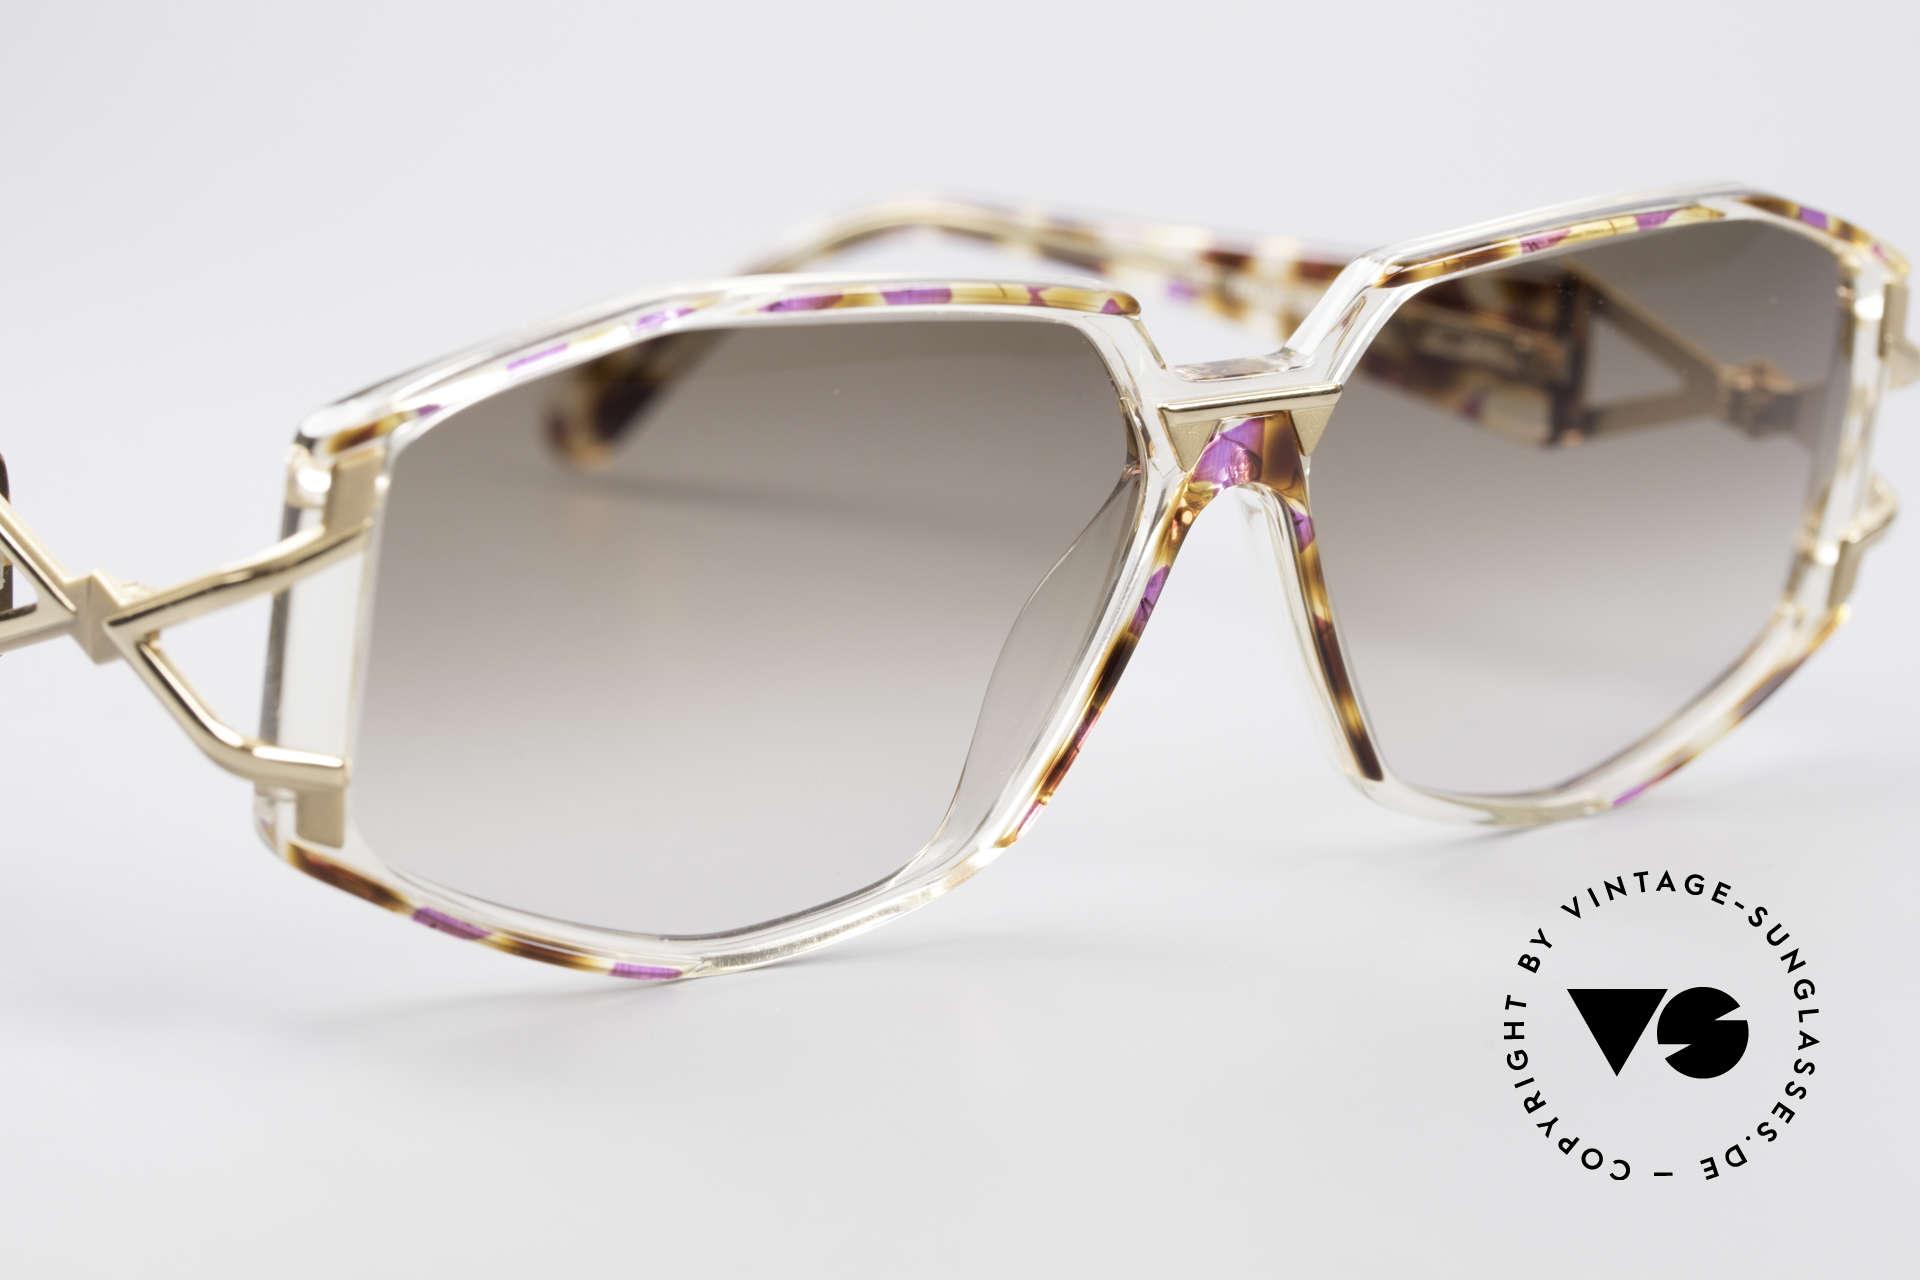 Cazal 368 Designer Shades Hip Hop Style, unworn (like all our rare VINTAGE designer sunglasses), Made for Women